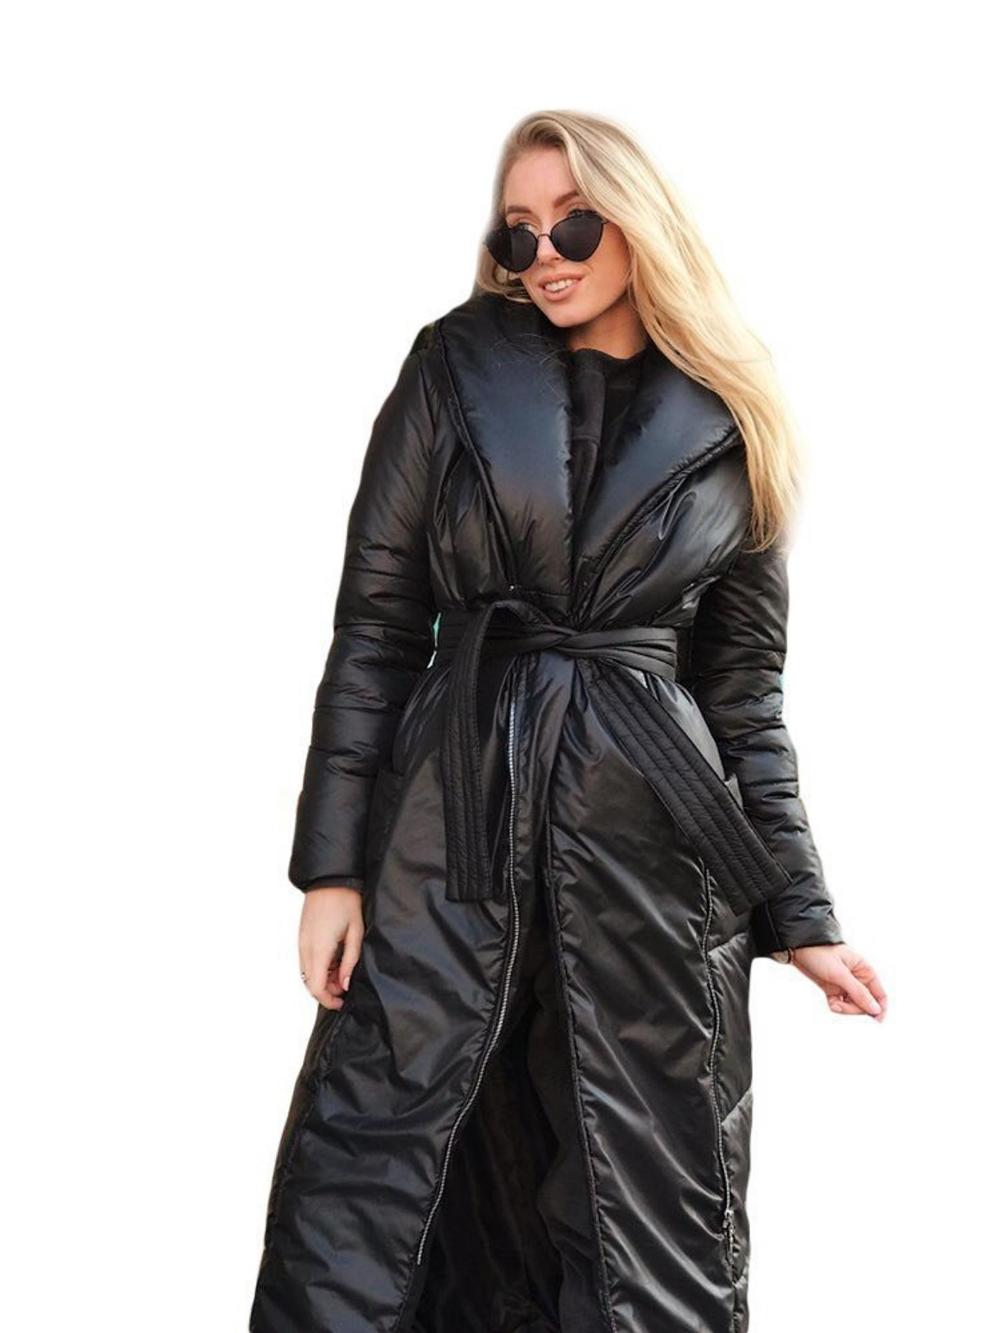 Down Coat Long Extra Warm Coat Puffer Coat Maxi Coat Blanket Winter Coat Black Coat Womens Jackets Winter Clothing Wrap Padded Coat 062 Mit Bildern Daunenmantel Daunenmantel Lang Modestil